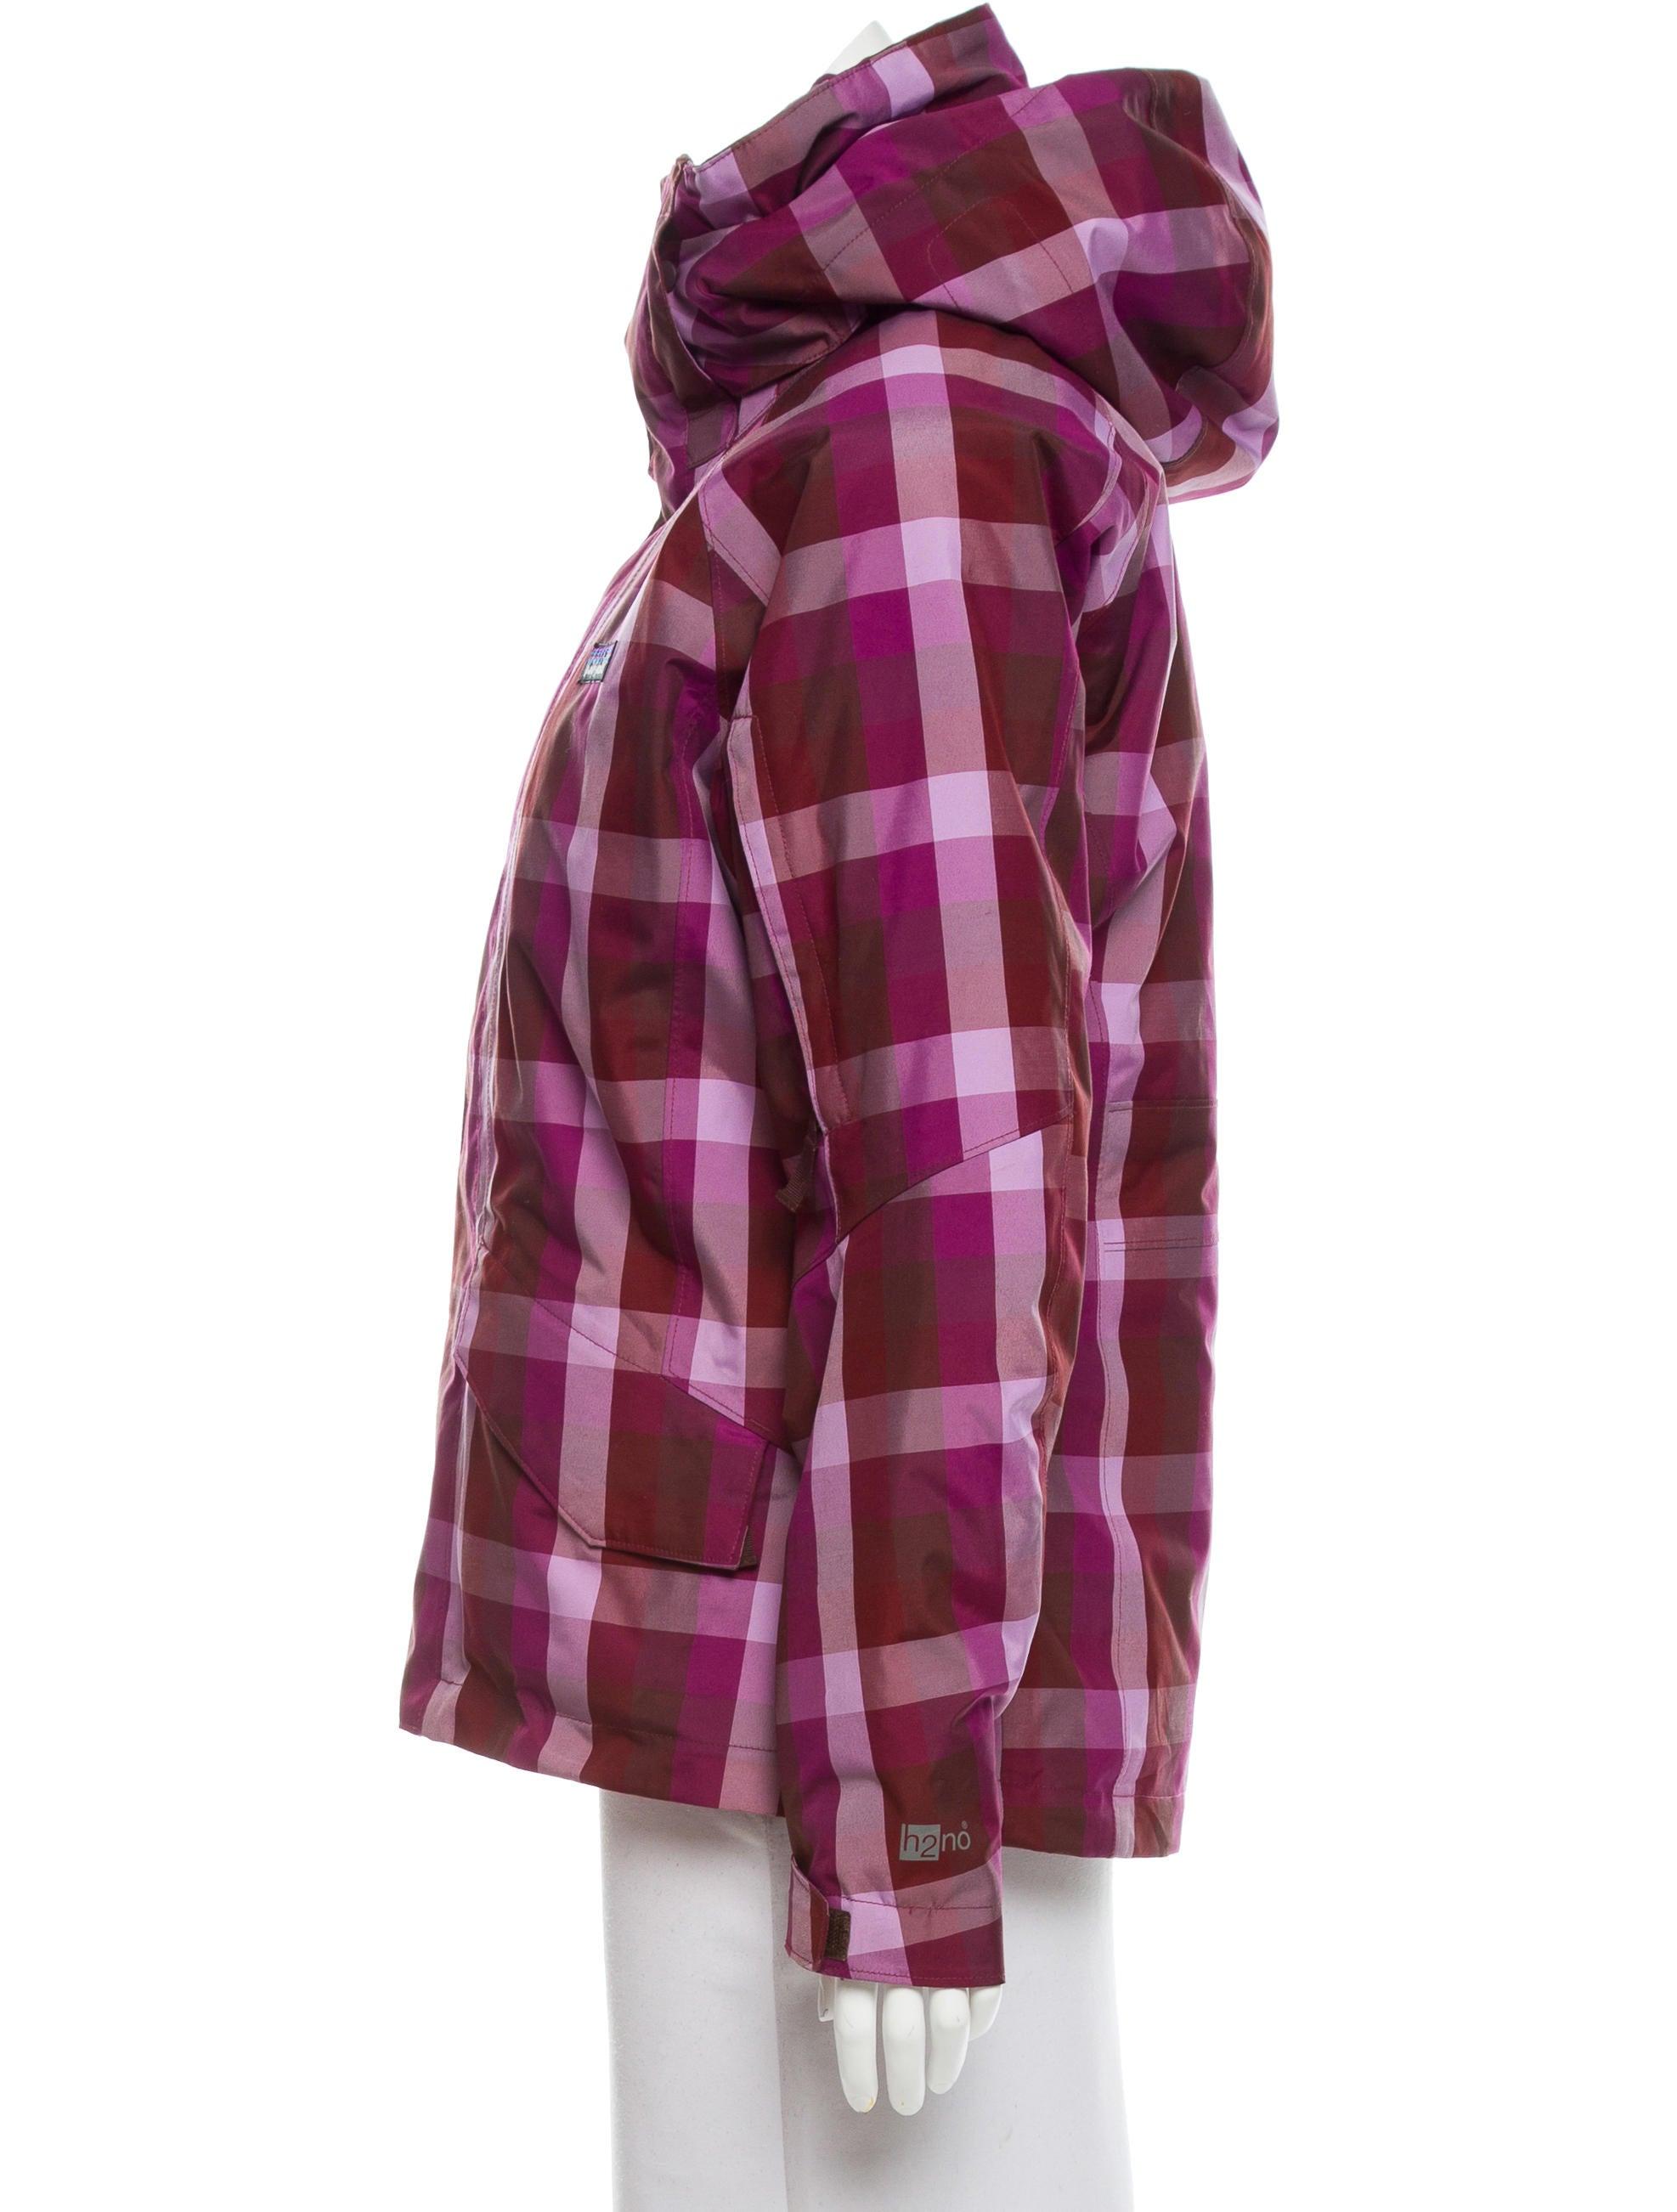 Patagonia lightweight plaid jacket clothing wpatg20845 for Lightweight plaid shirt womens